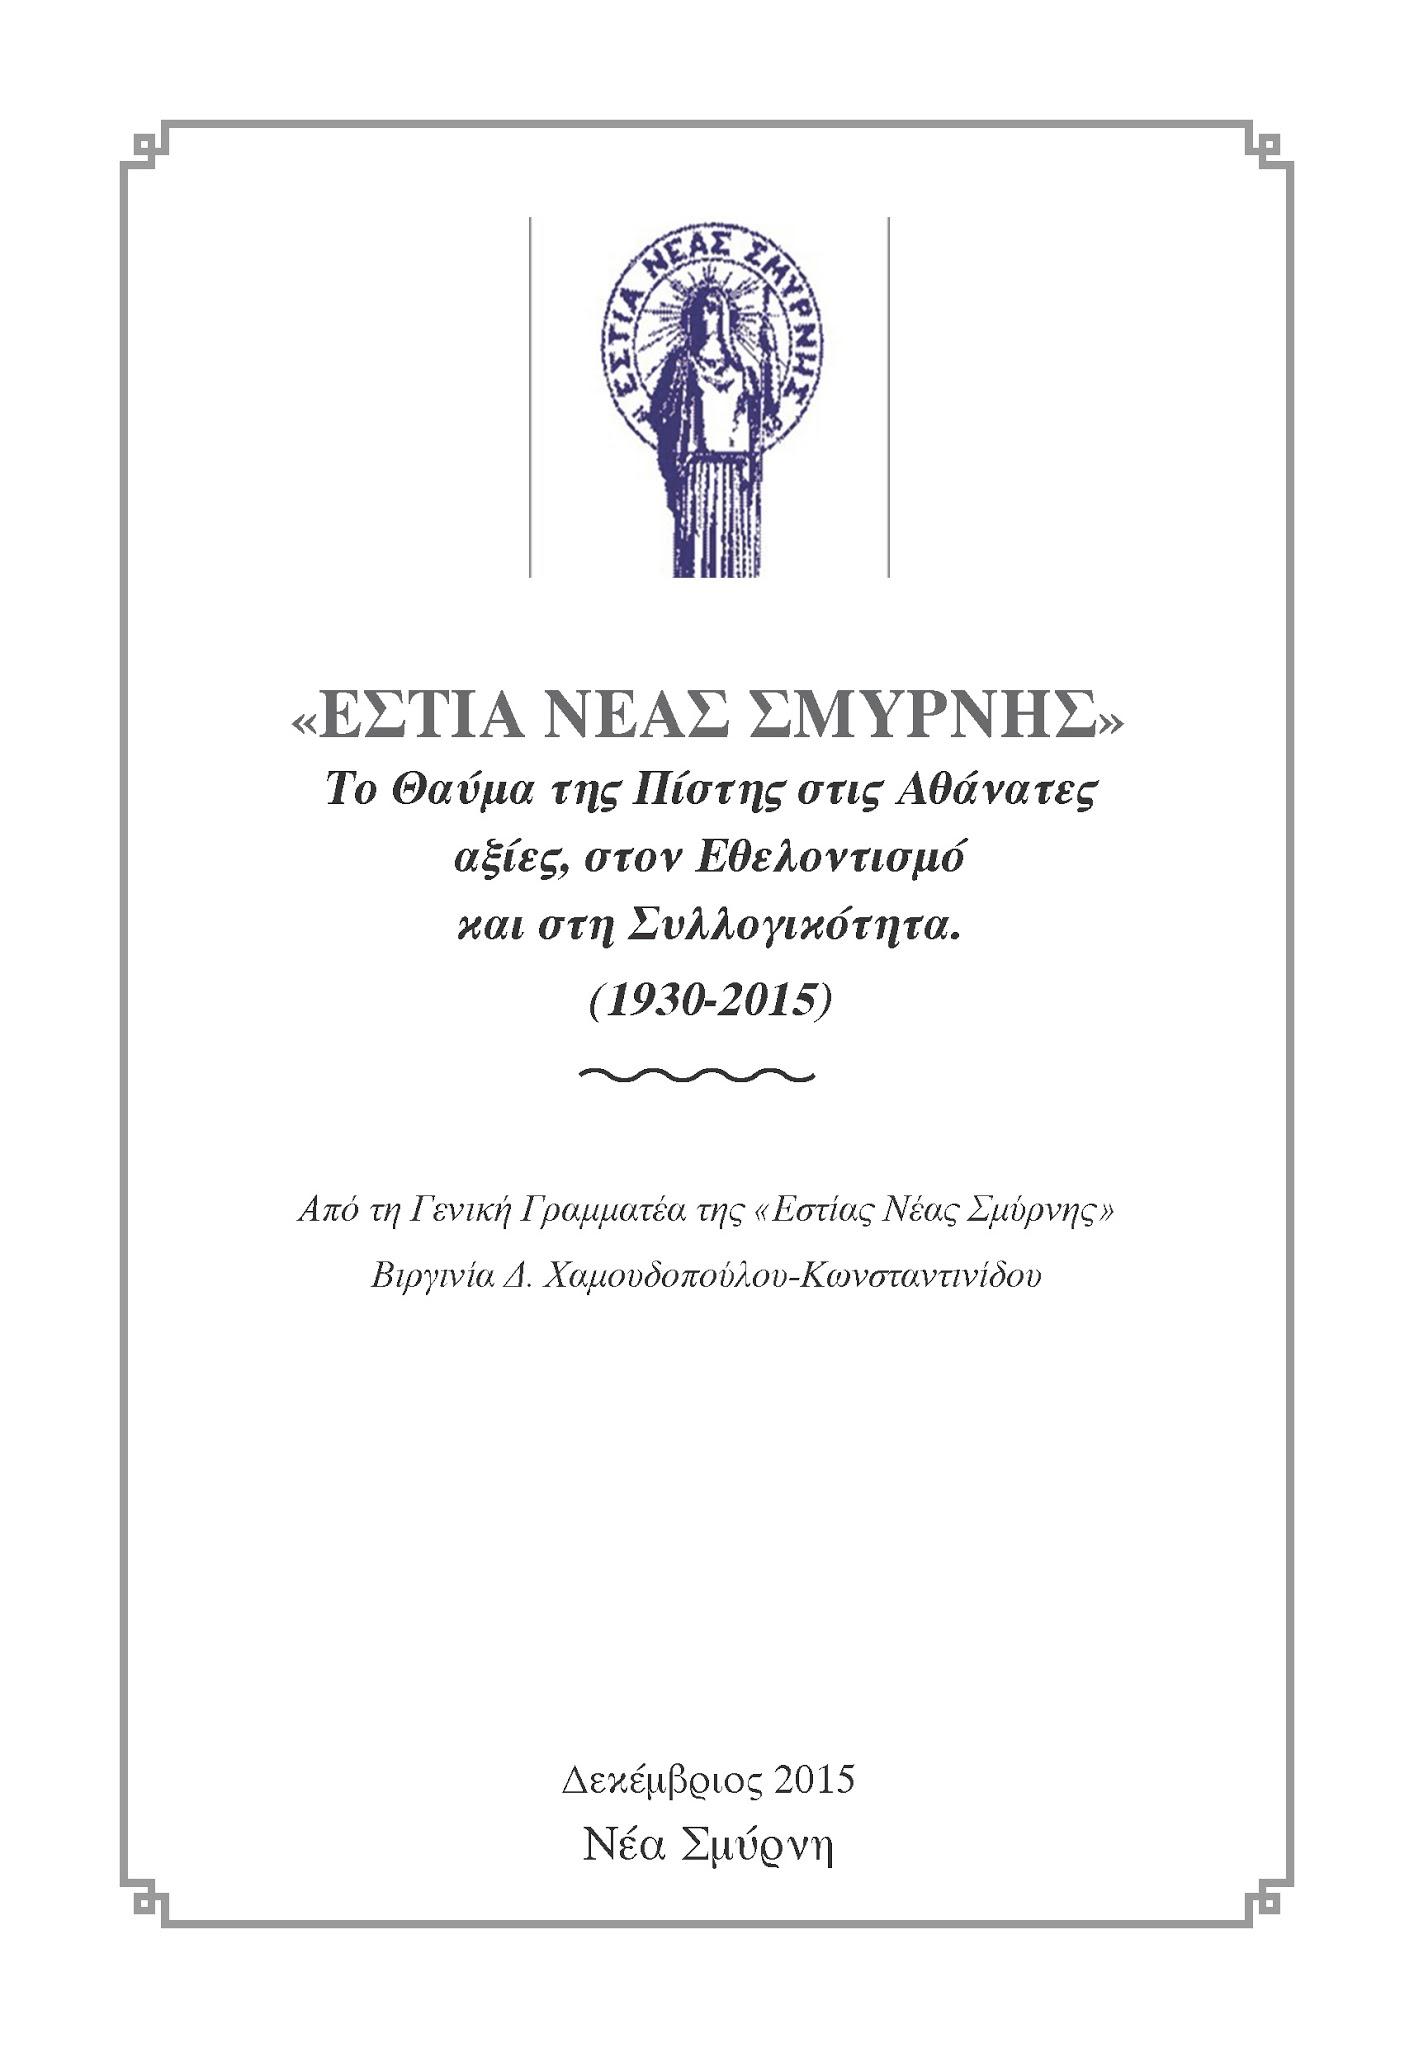 Photo: ΕΣΤΙΑ ΝΕΑΣ ΣΜΥΡΝΗΣ: «Το θαύμα της Πίστης στις Αθάνατες αξίες, στον Εθελοντισμό και στη Συλλογικότητα», της Βιργινίας Χαμουδοπούλου-Κωνσταντινίδου, Γενικής Γραμματέως της Εστίας, Δεκέμβριος 2015, σελ. 1.